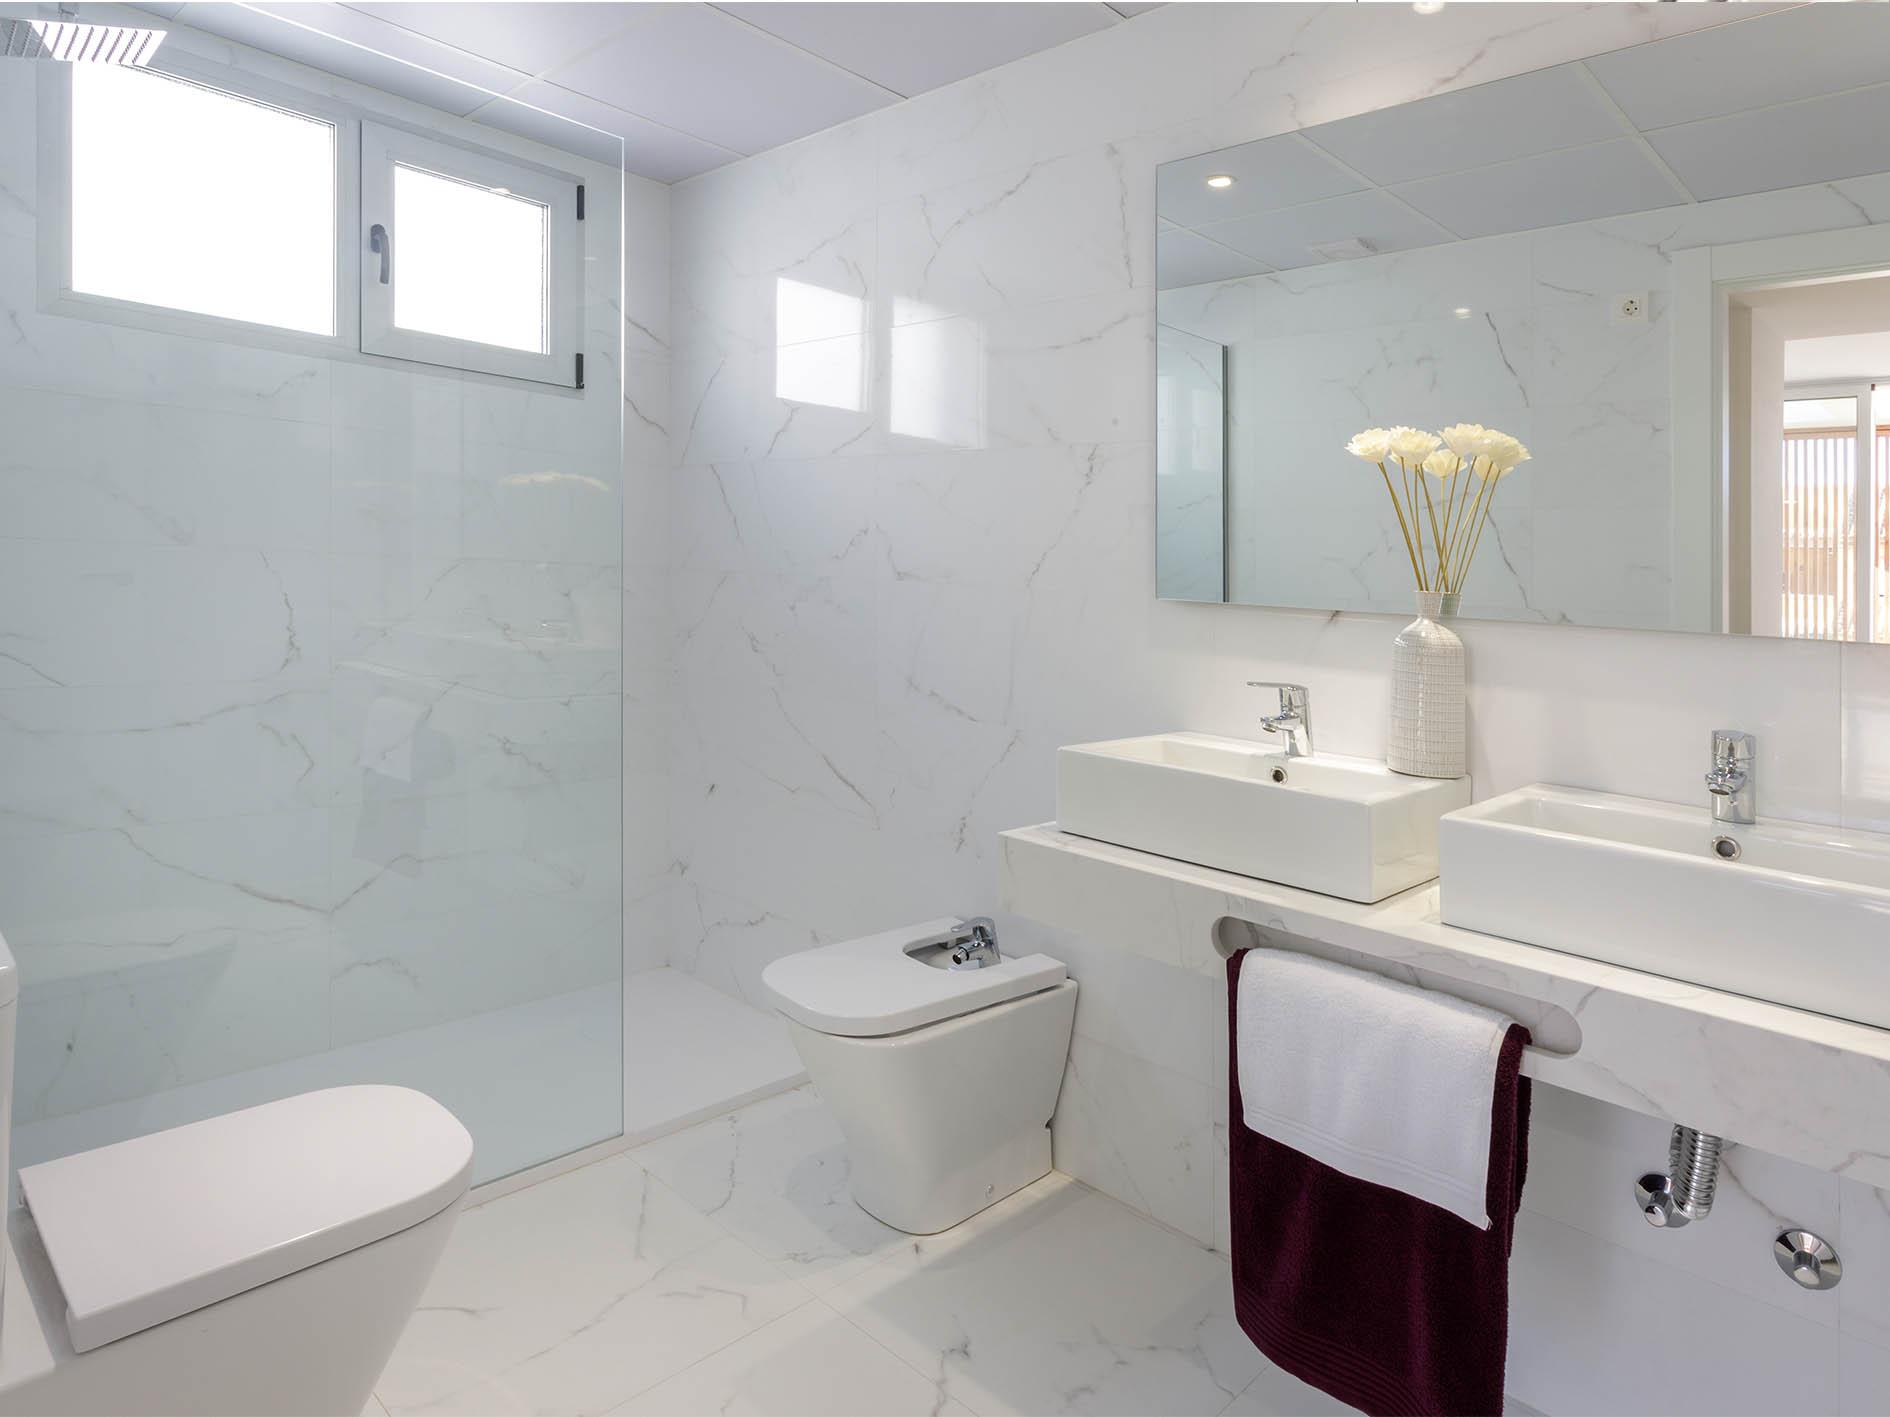 immobilier neuf espagne costa blanca on-d9 el farallon sdb 2